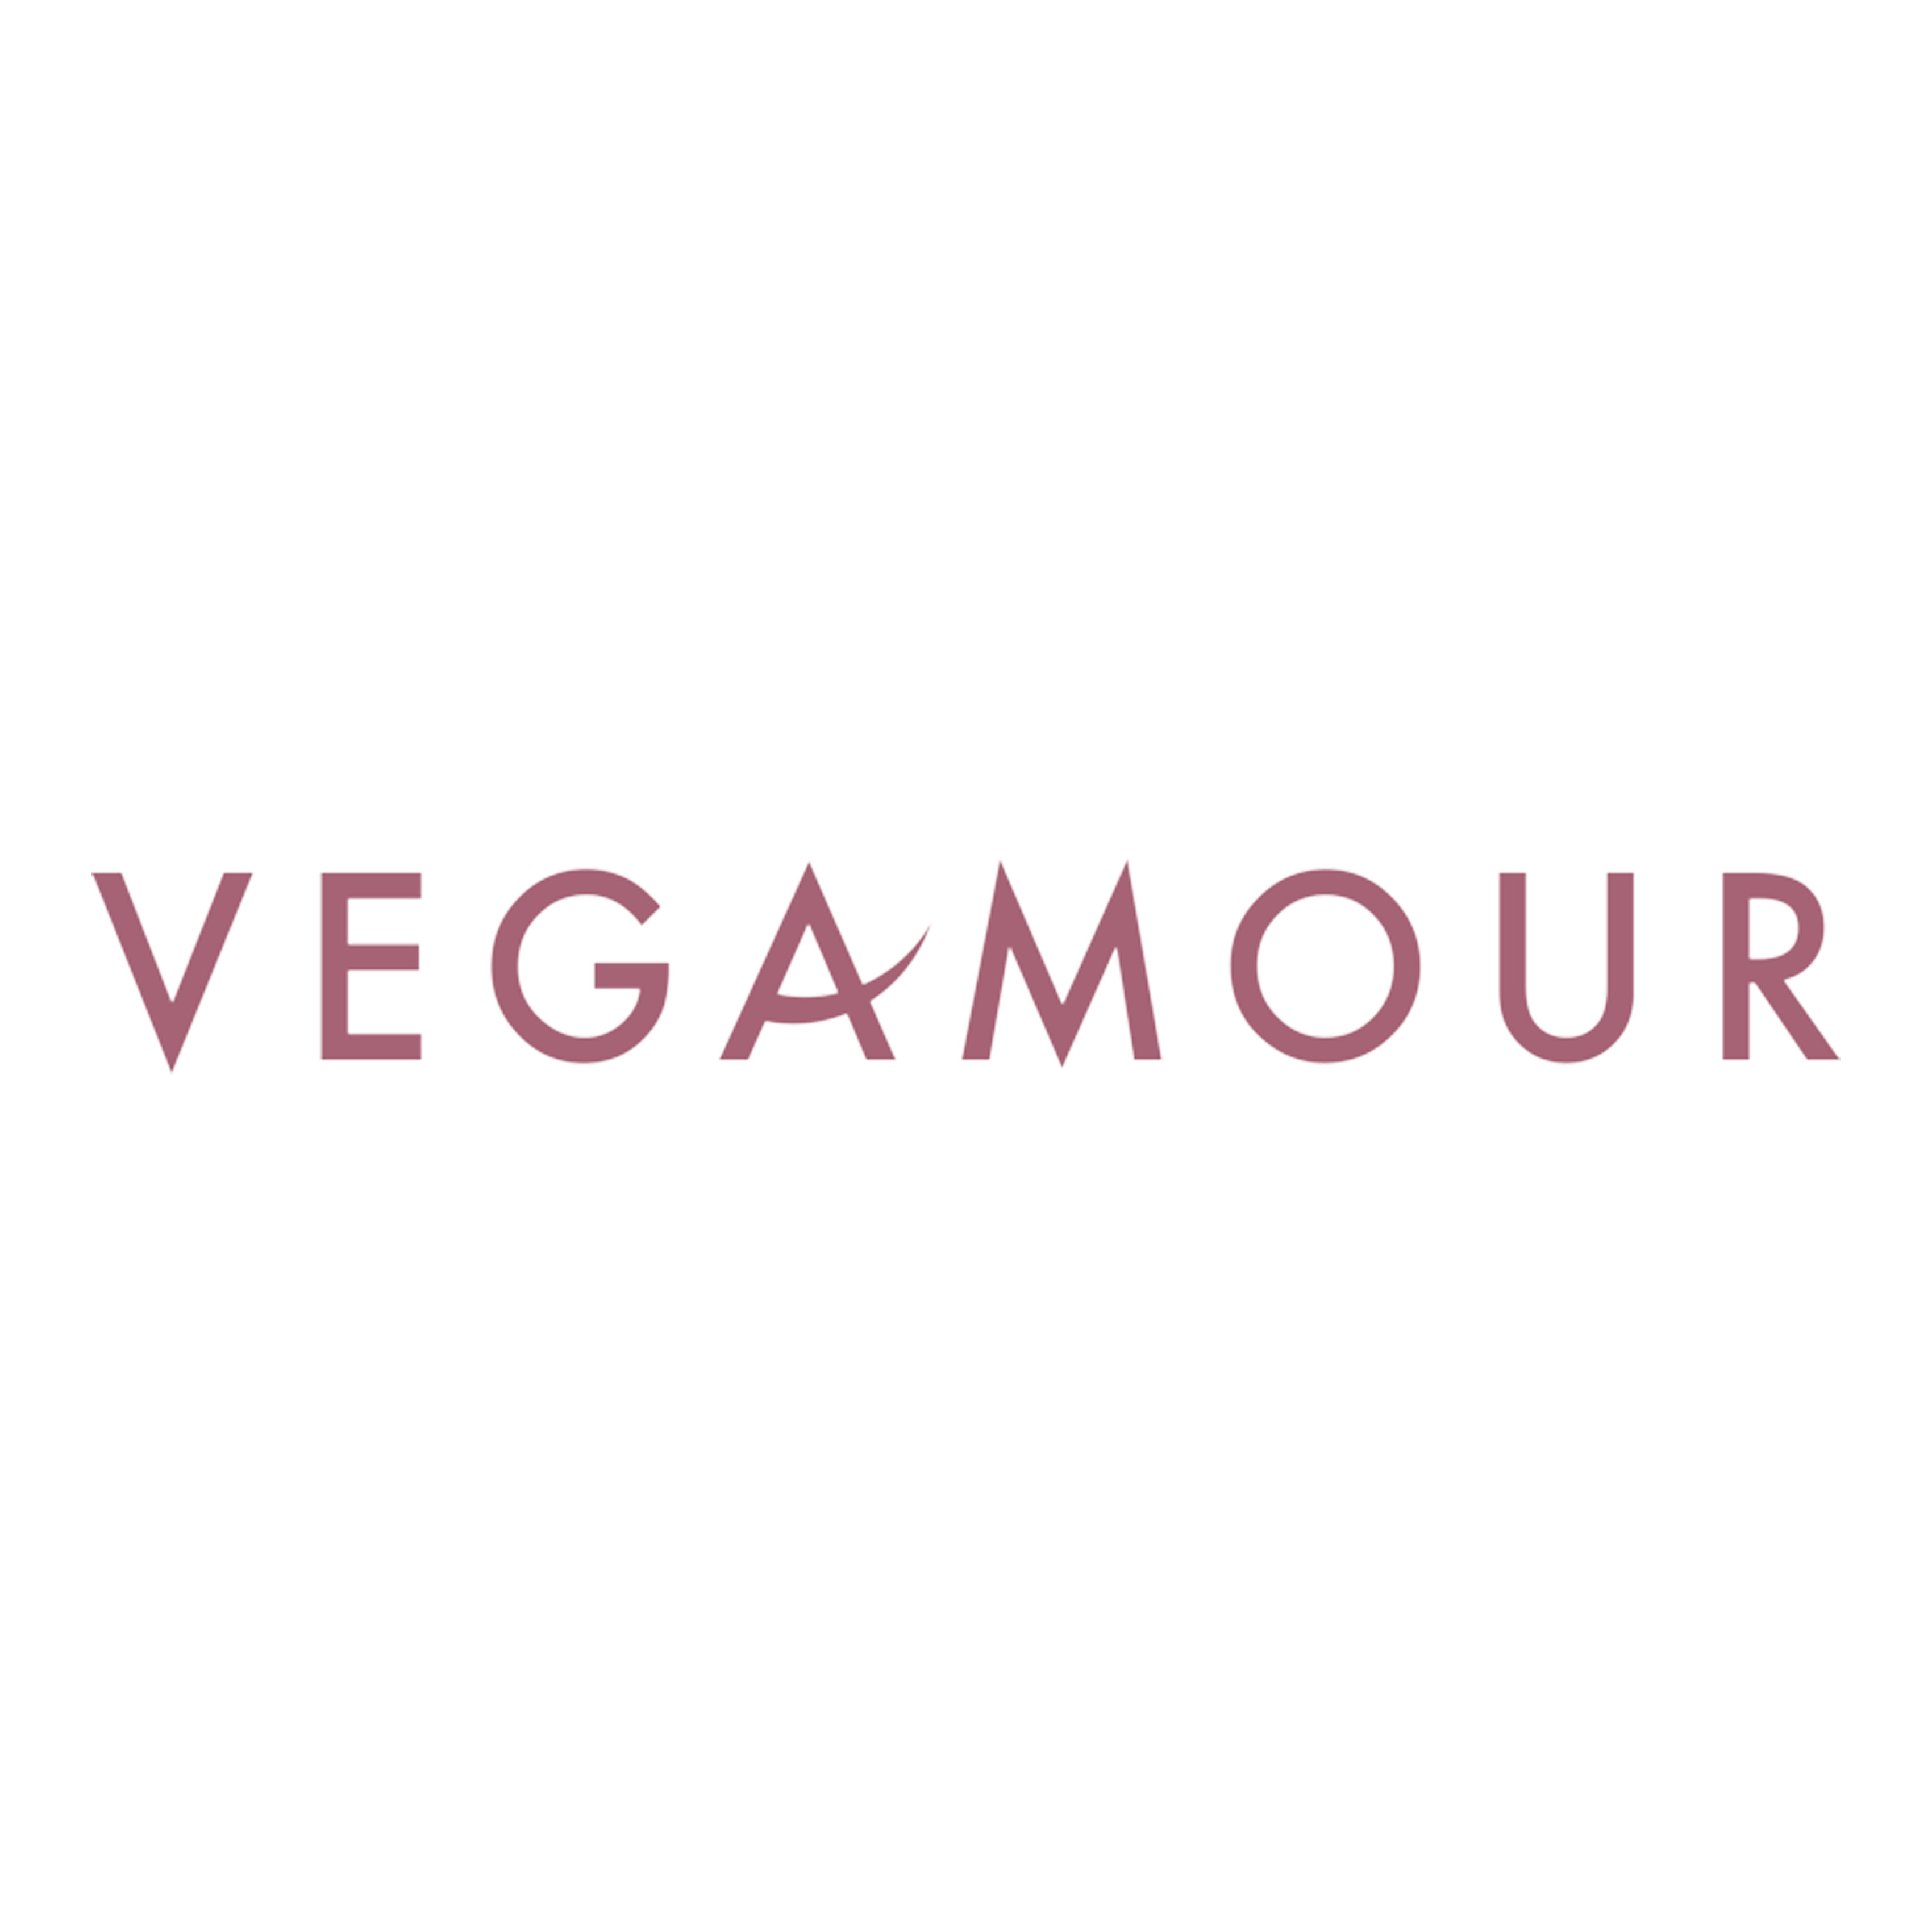 vegamour logo